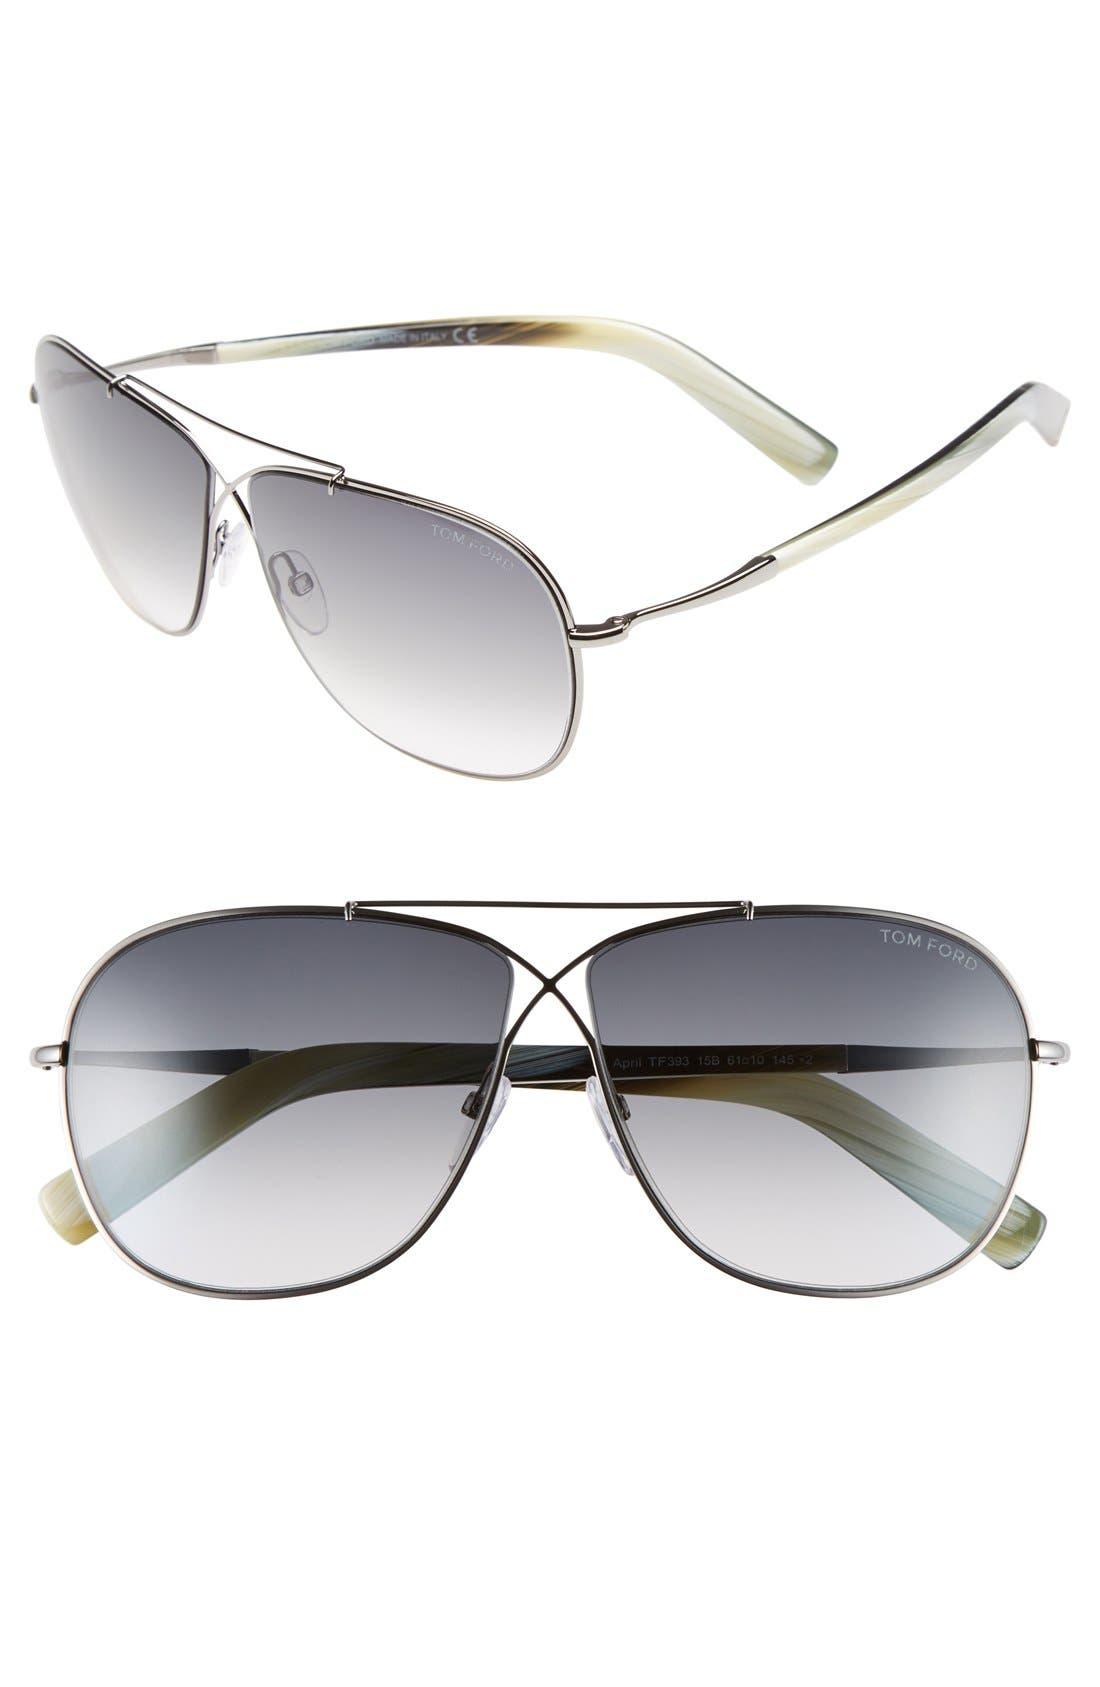 'April' 61mm Retro Sunglasses,                             Main thumbnail 1, color,                             Ruthenium/ Gradient Smoke